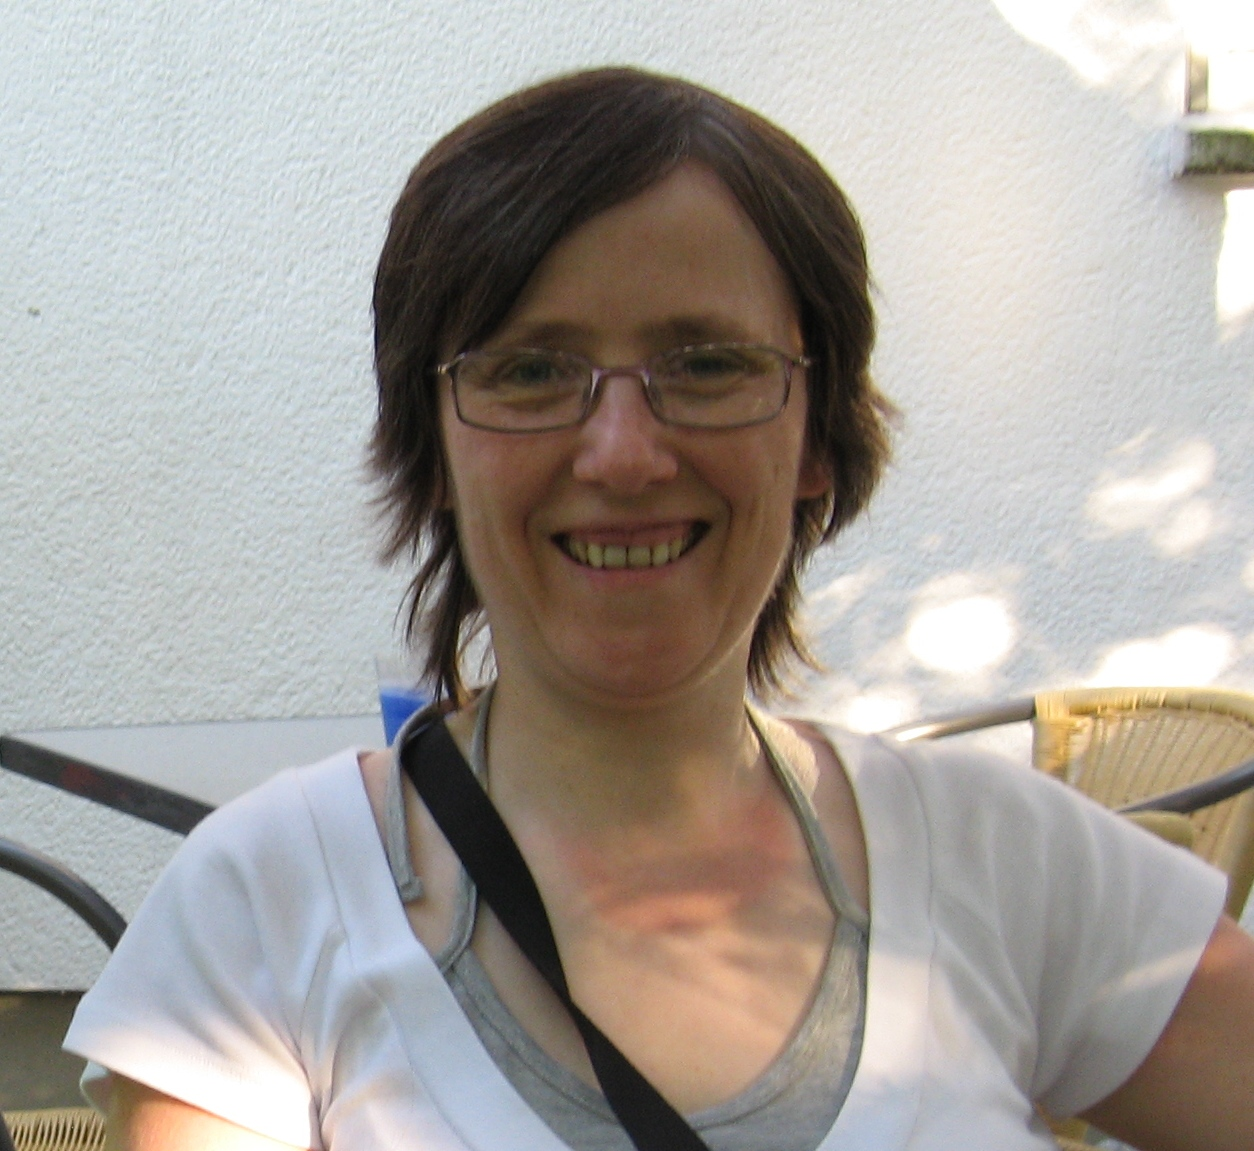 Ruth Bingham - PhD - Subject Matter Expert from Kolabtree